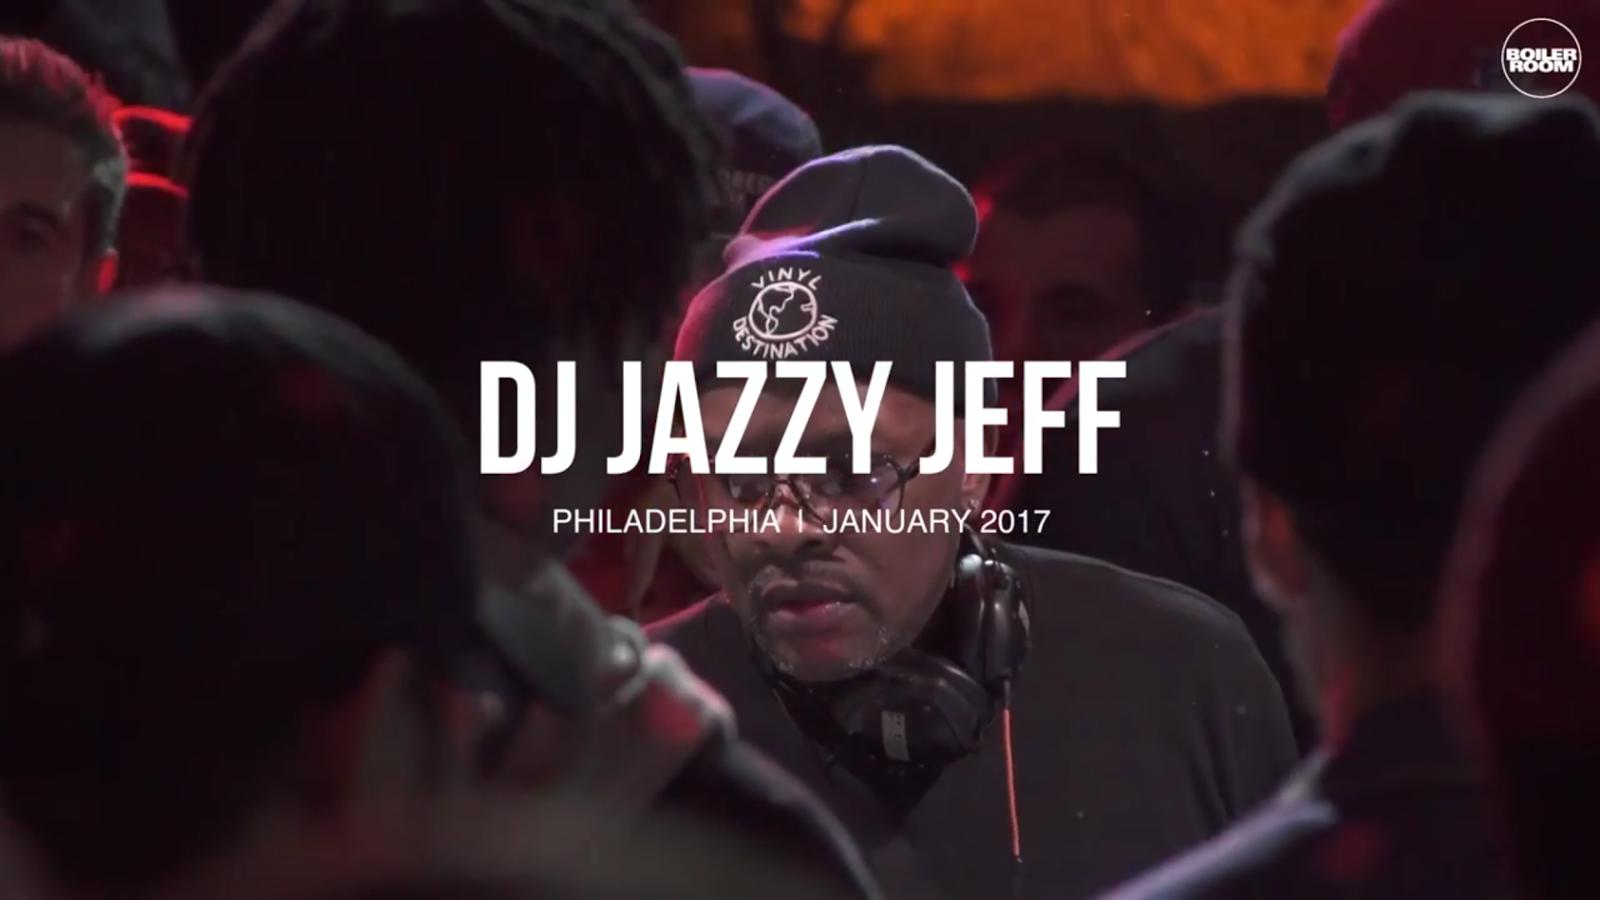 Dj Jazzy Jeff Boiler Room Tracklist